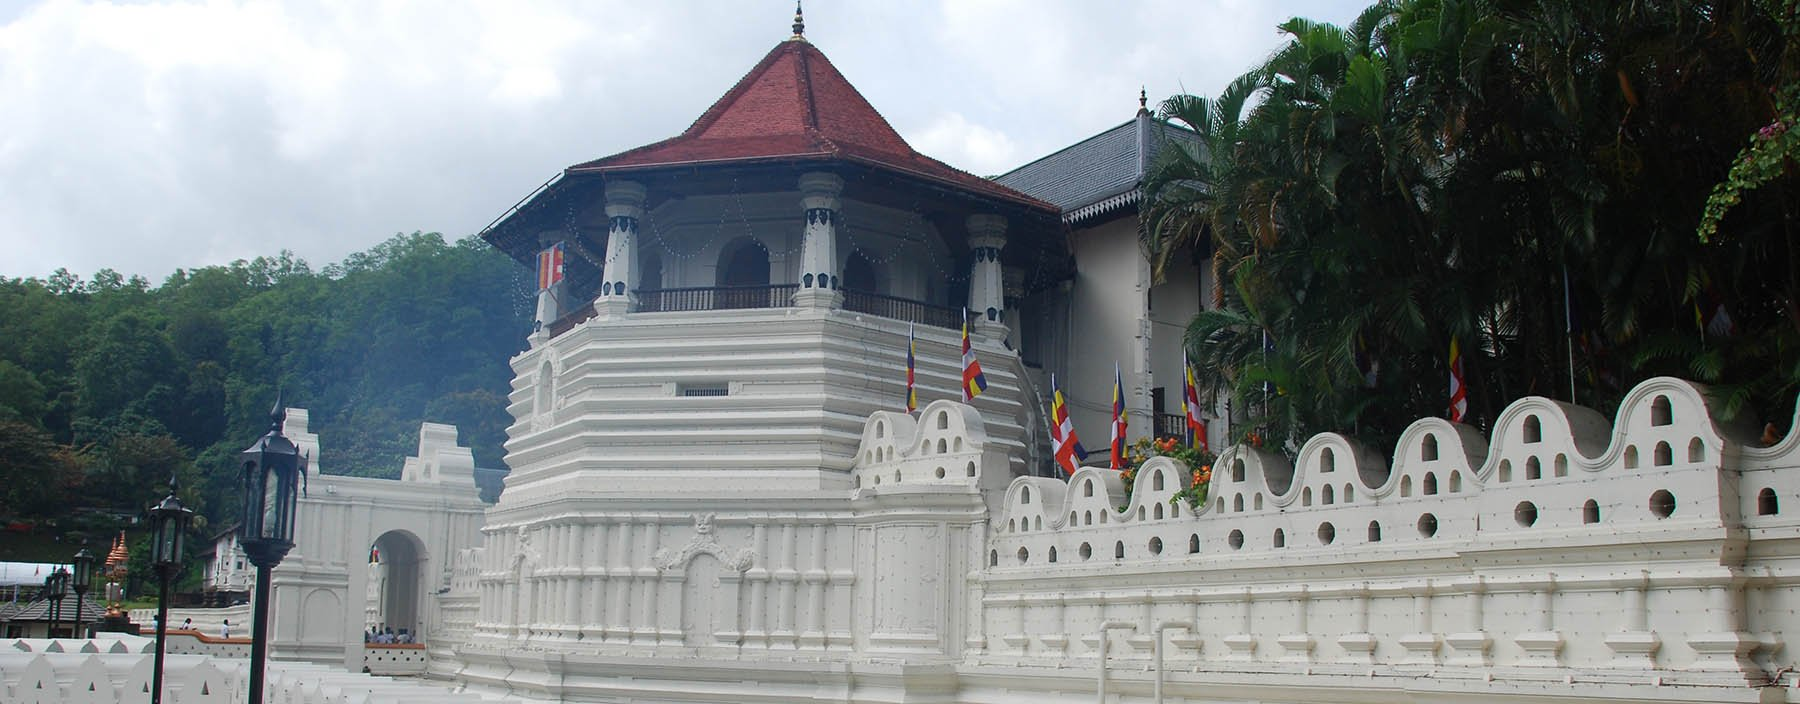 sri lanka, kandy, tempel van de tand (4).jpg